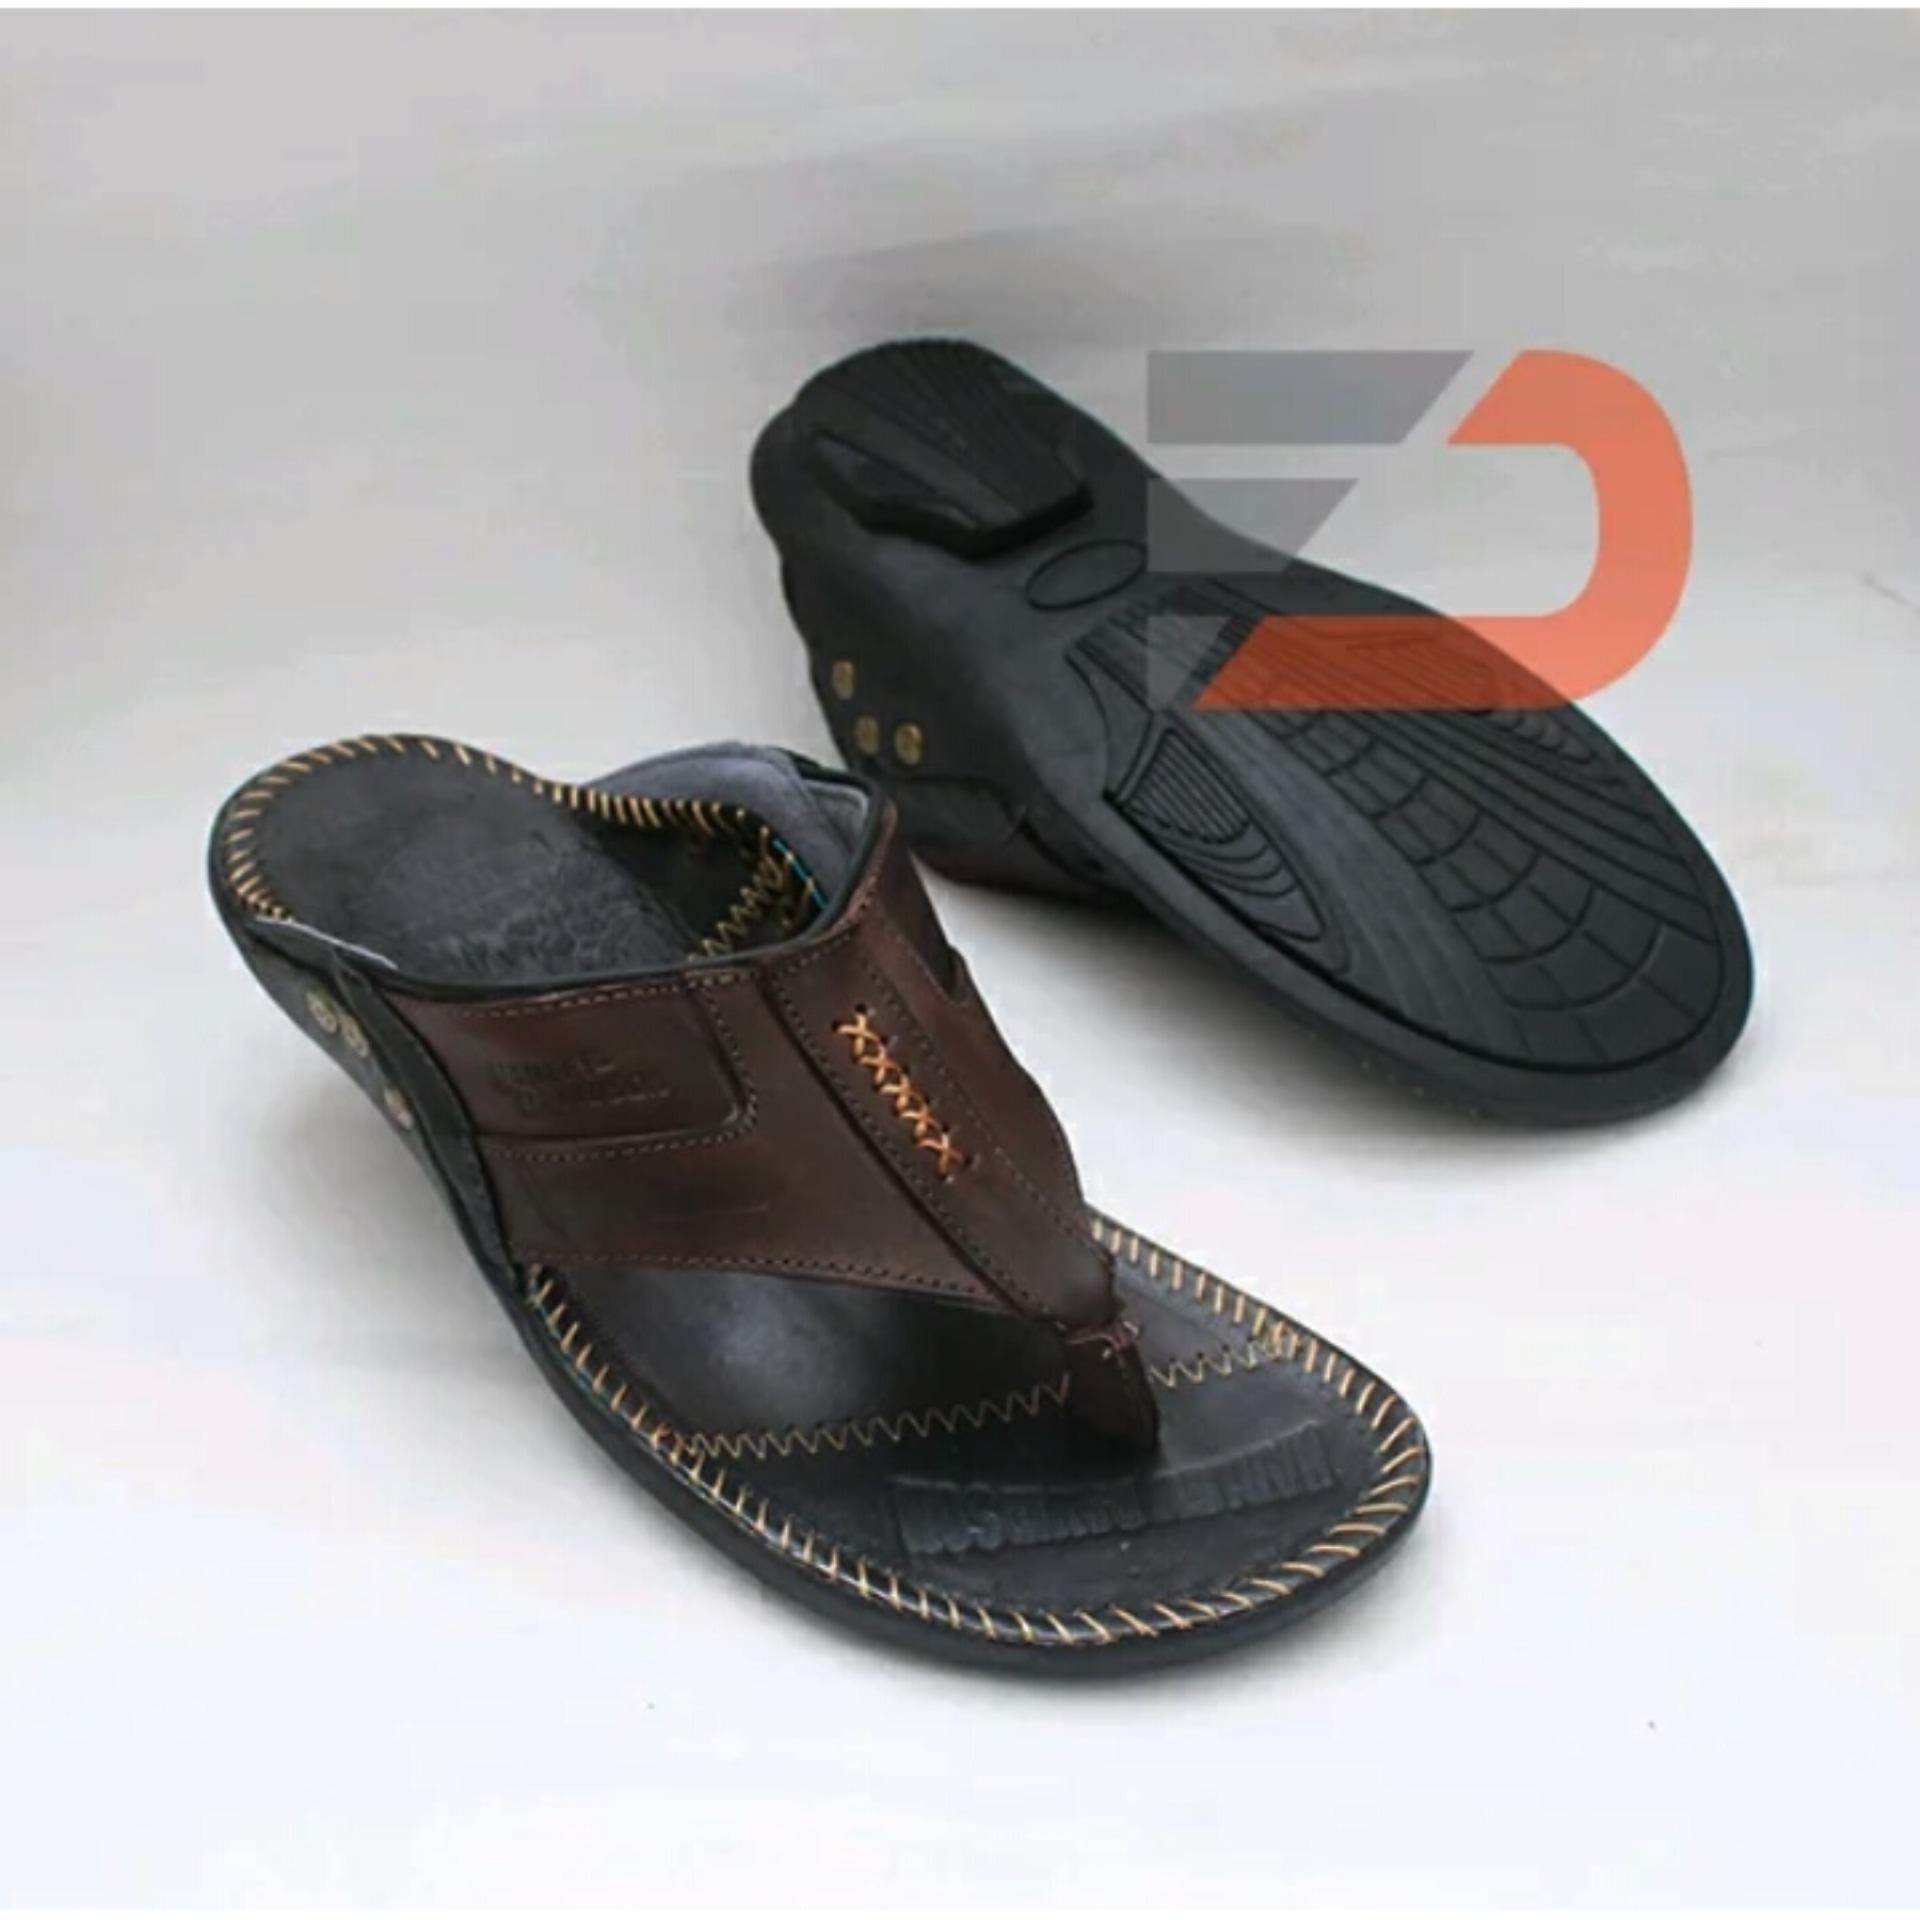 Sandal Santai Japit Pria Bahan Kulit Sapi Asli HR4